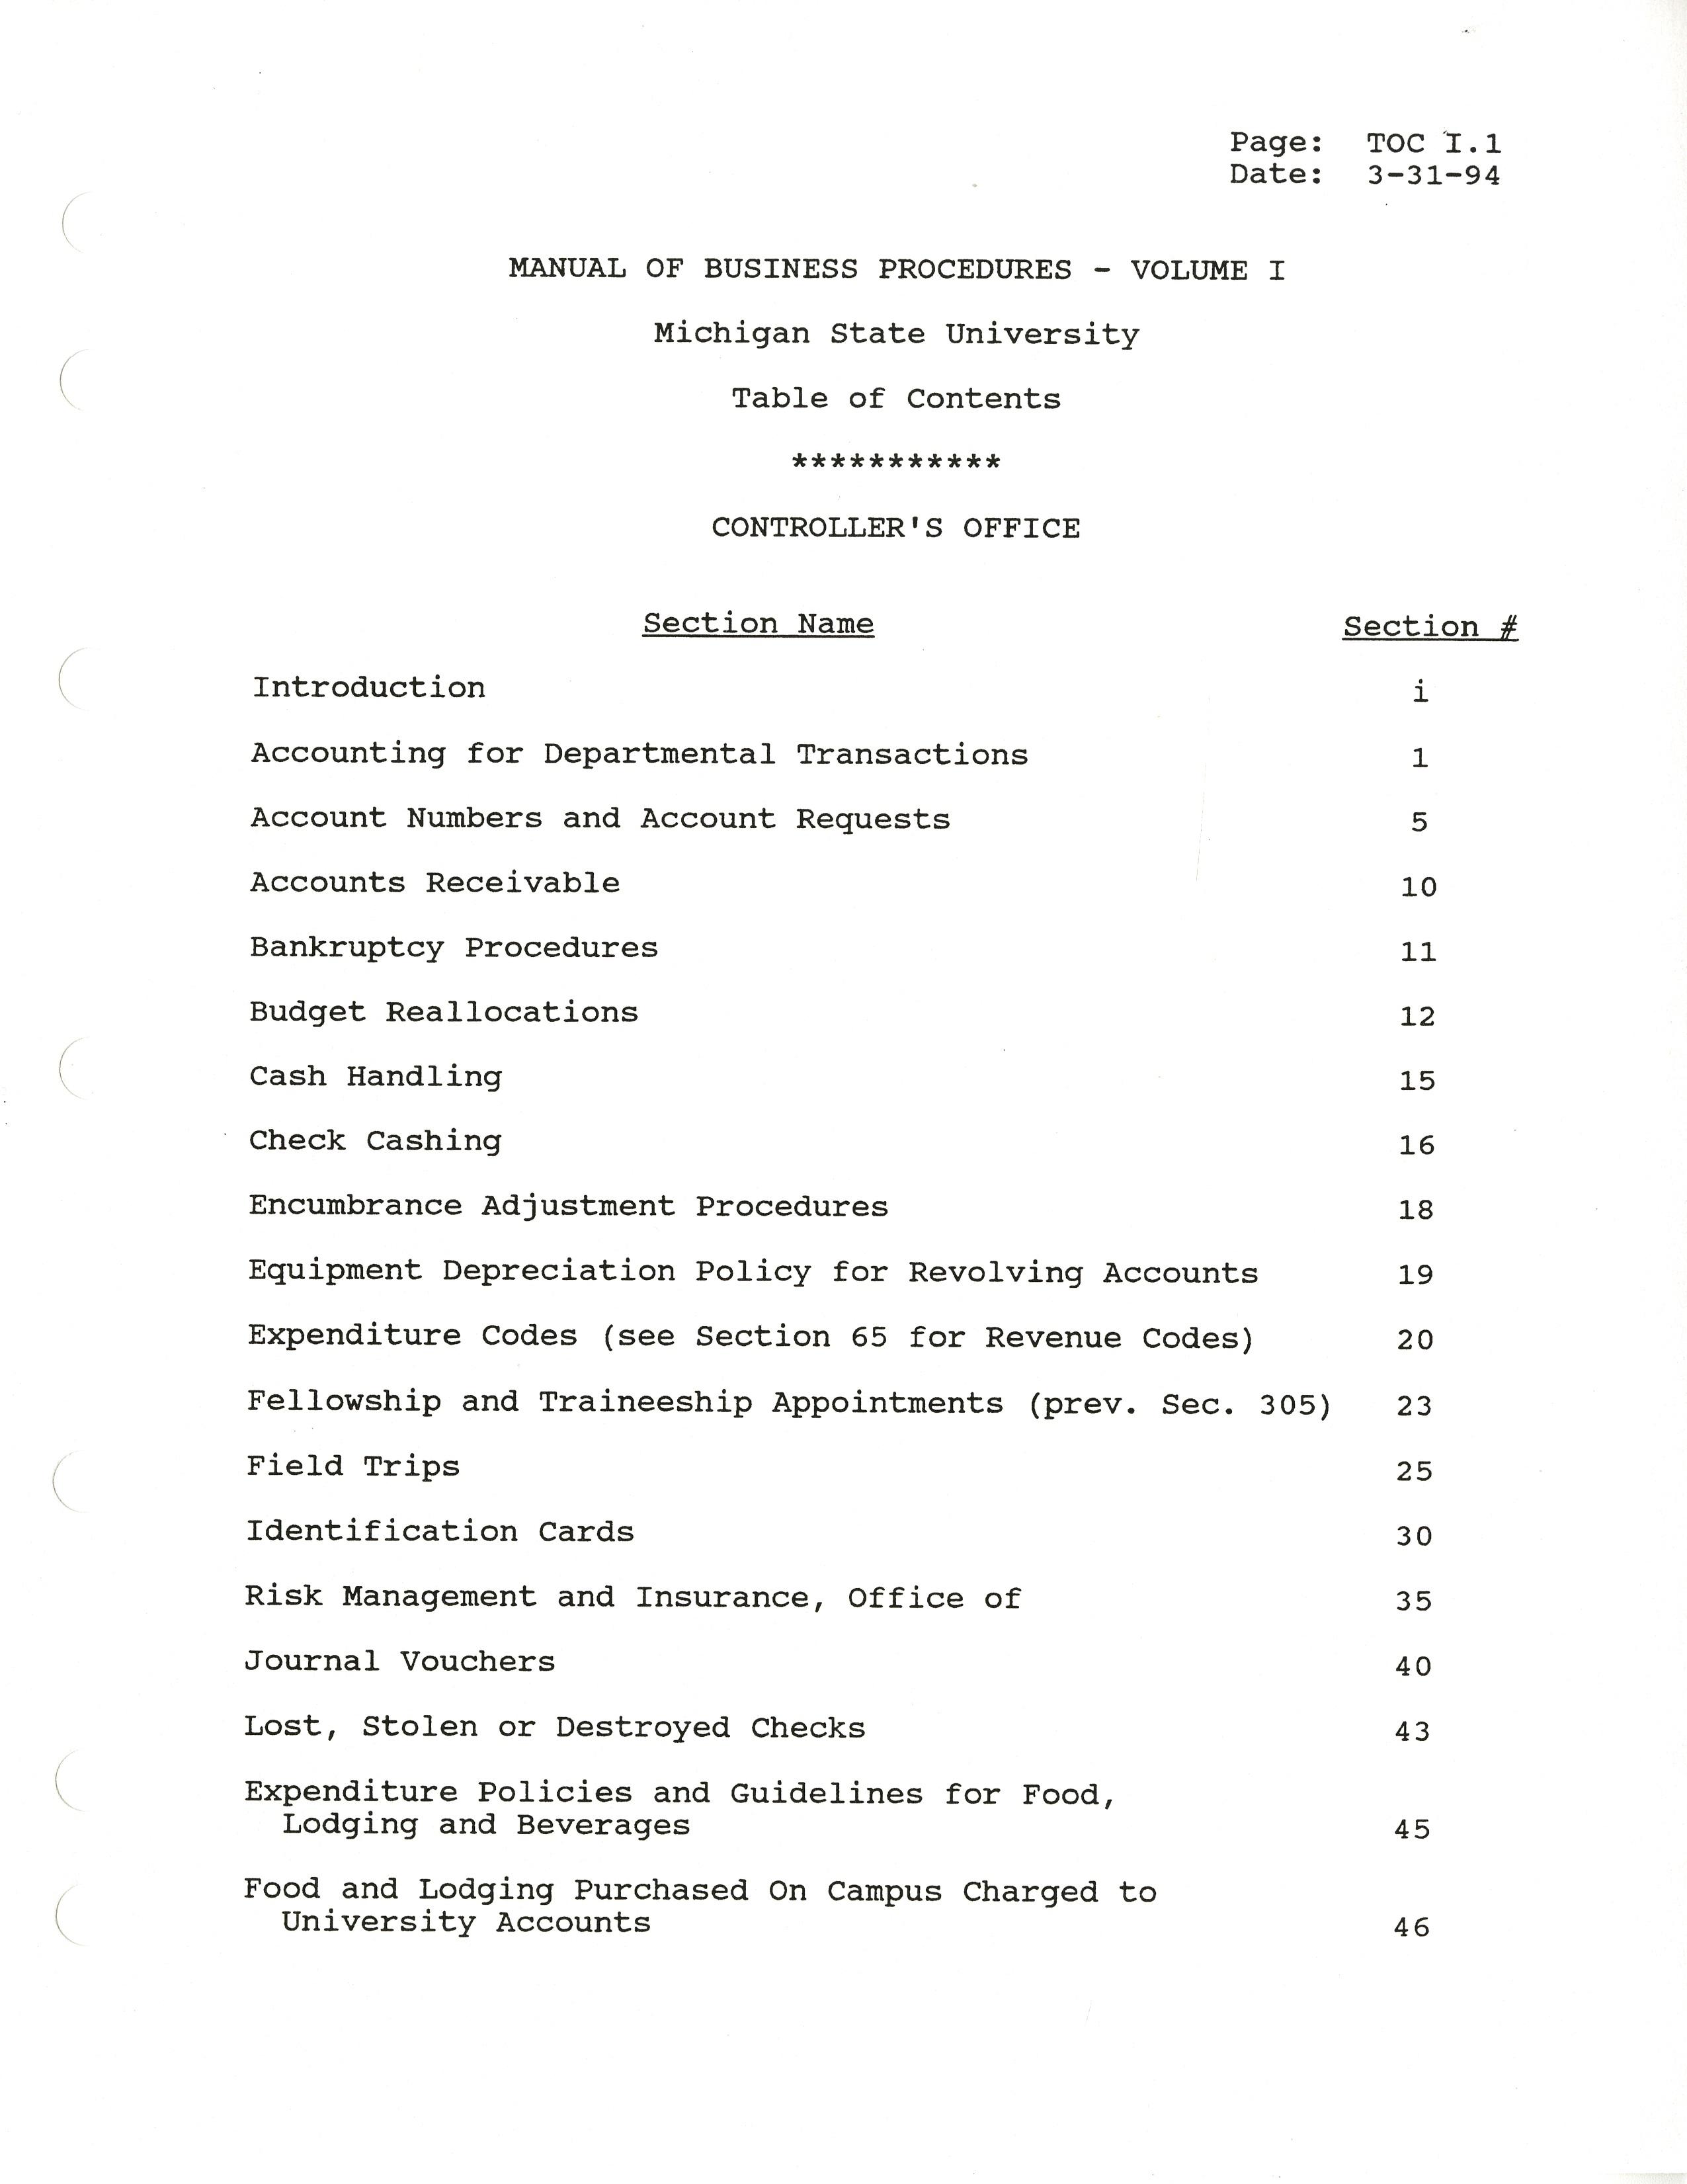 MSU Manual of Business Procedures, 1994